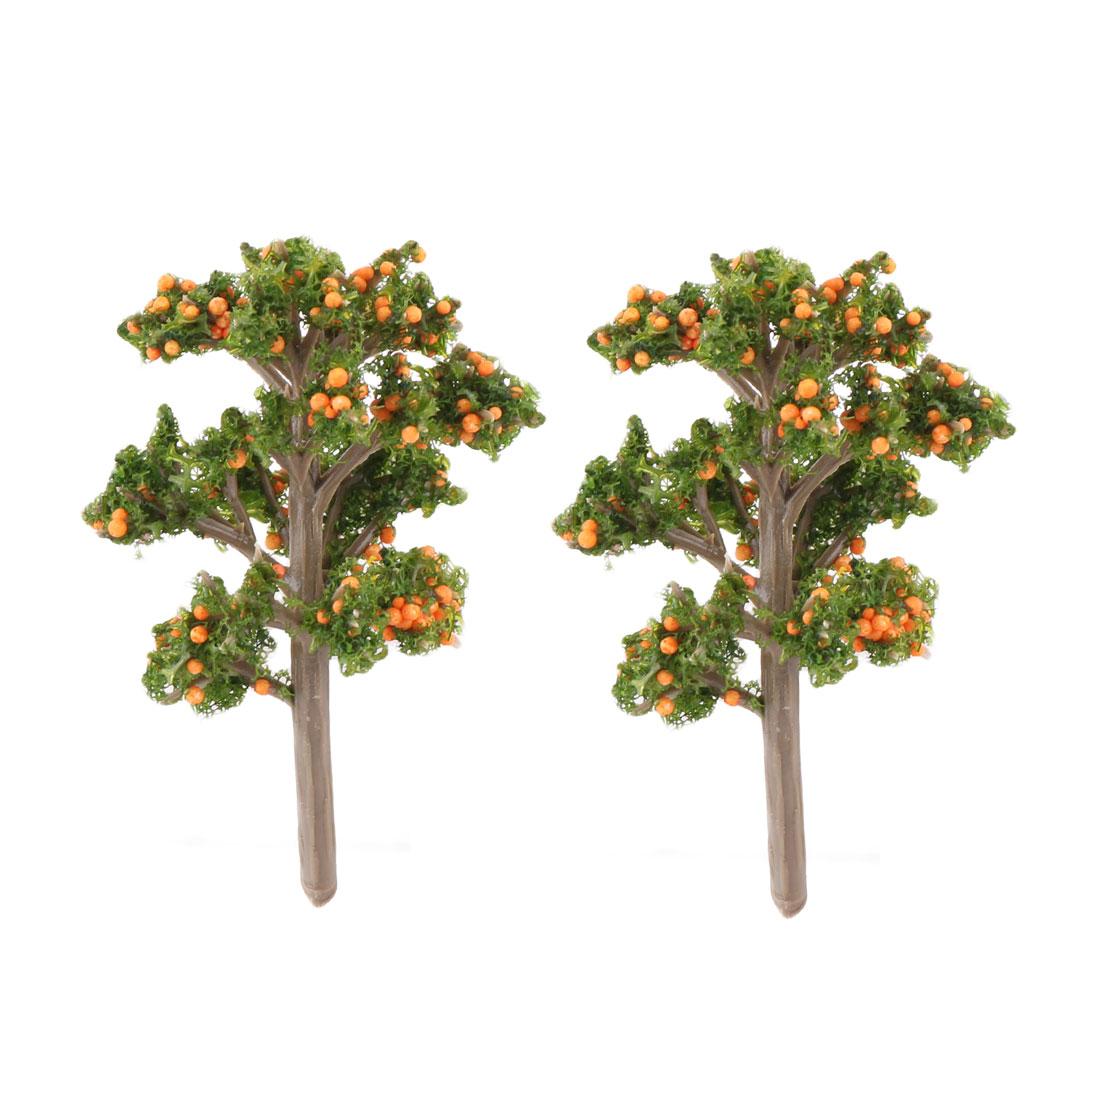 Family Decor Resin DIY Craft Artificial Plant Tree Bonsai Landscape Orange 2 Pcs